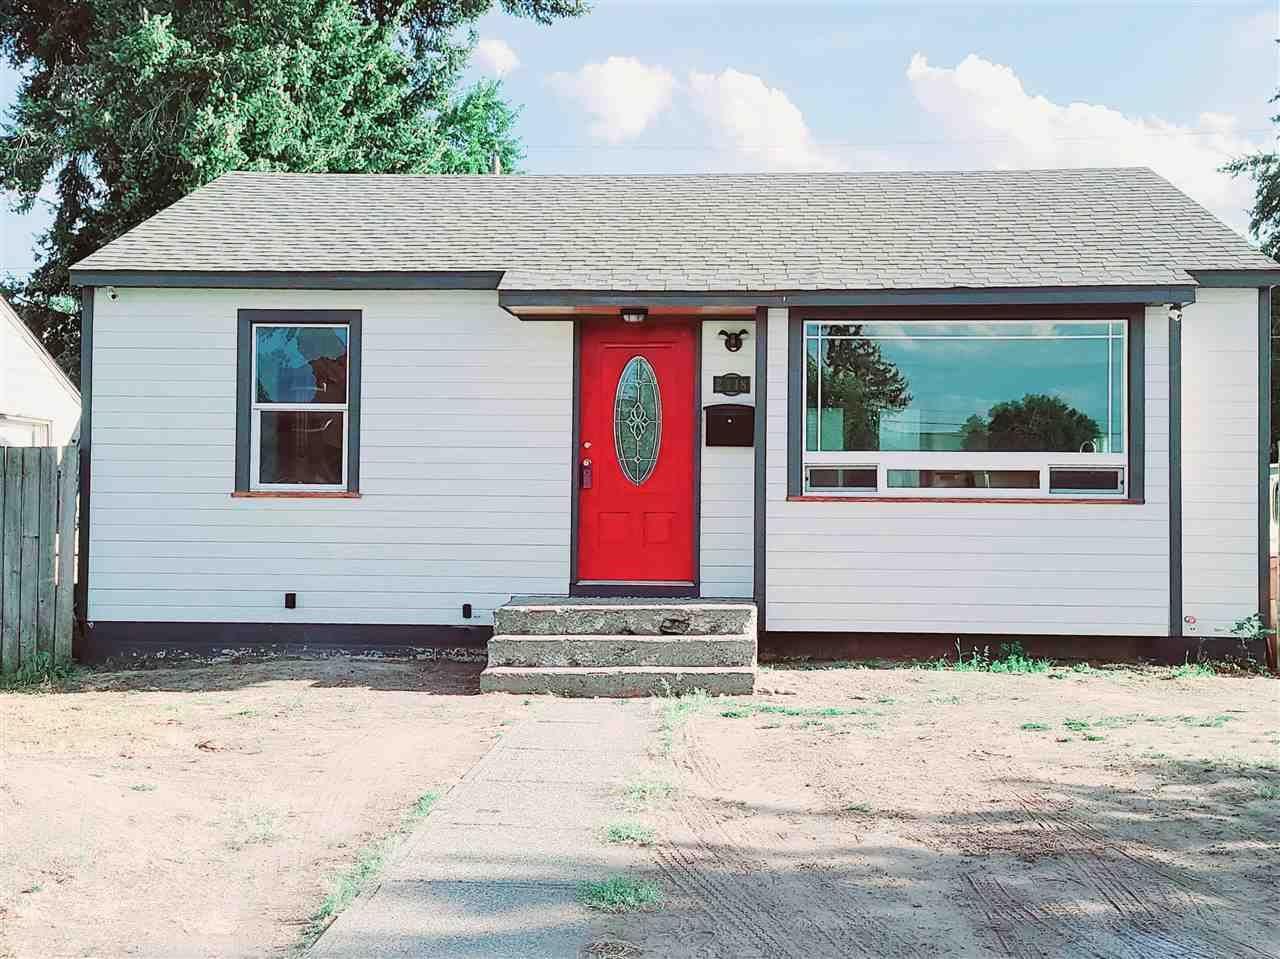 2418 E Hoffman Ave, Spokane, WA 99207-5941 - #: 202115050